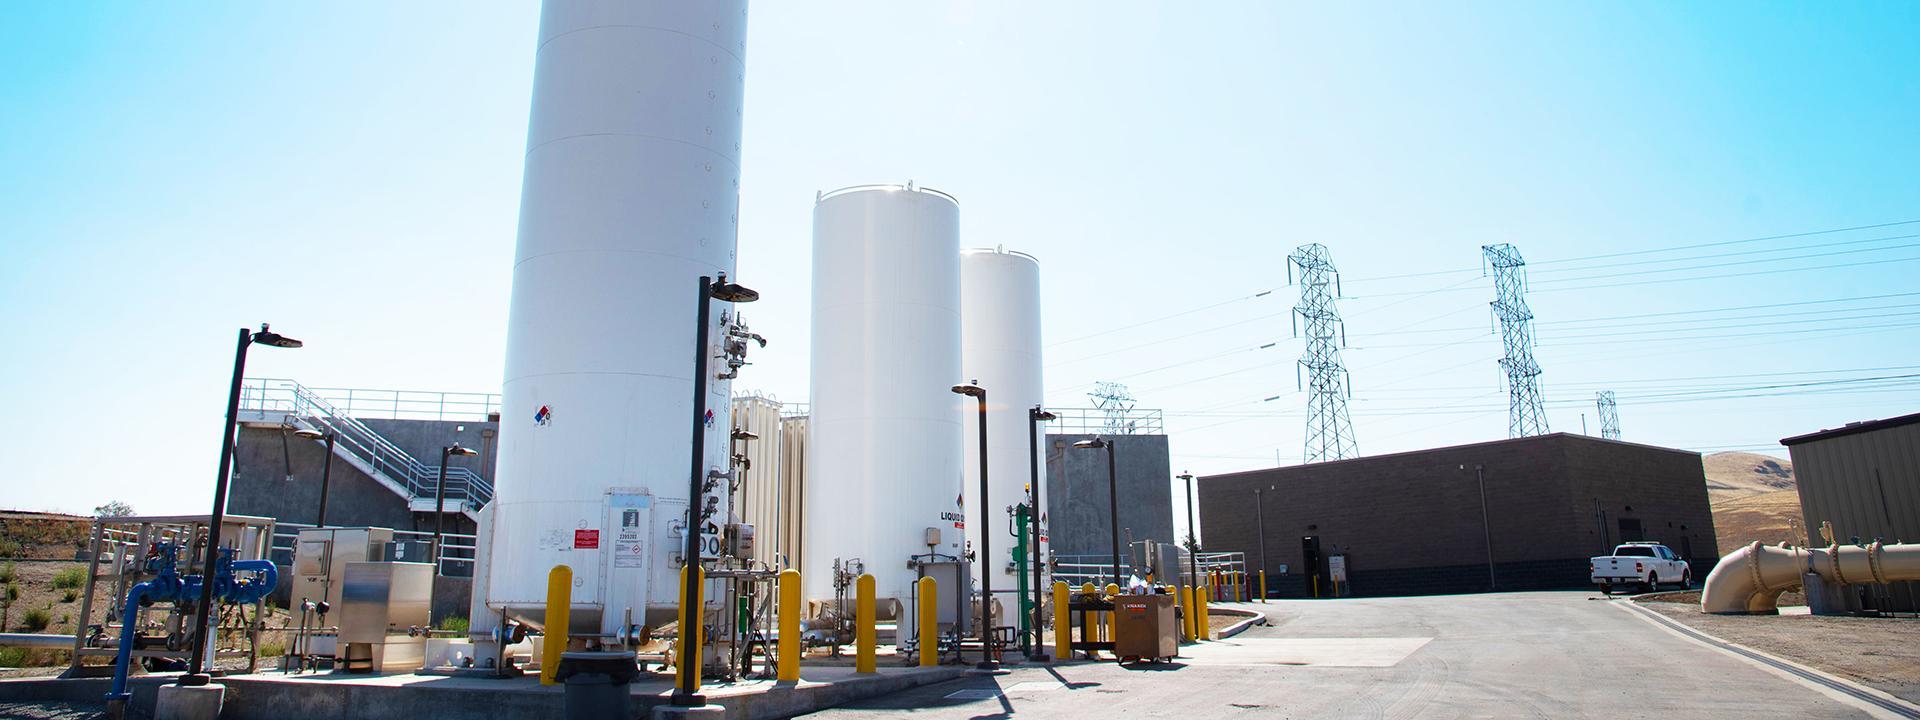 Liquid Oxygen Tanks and Ozone Generator Building